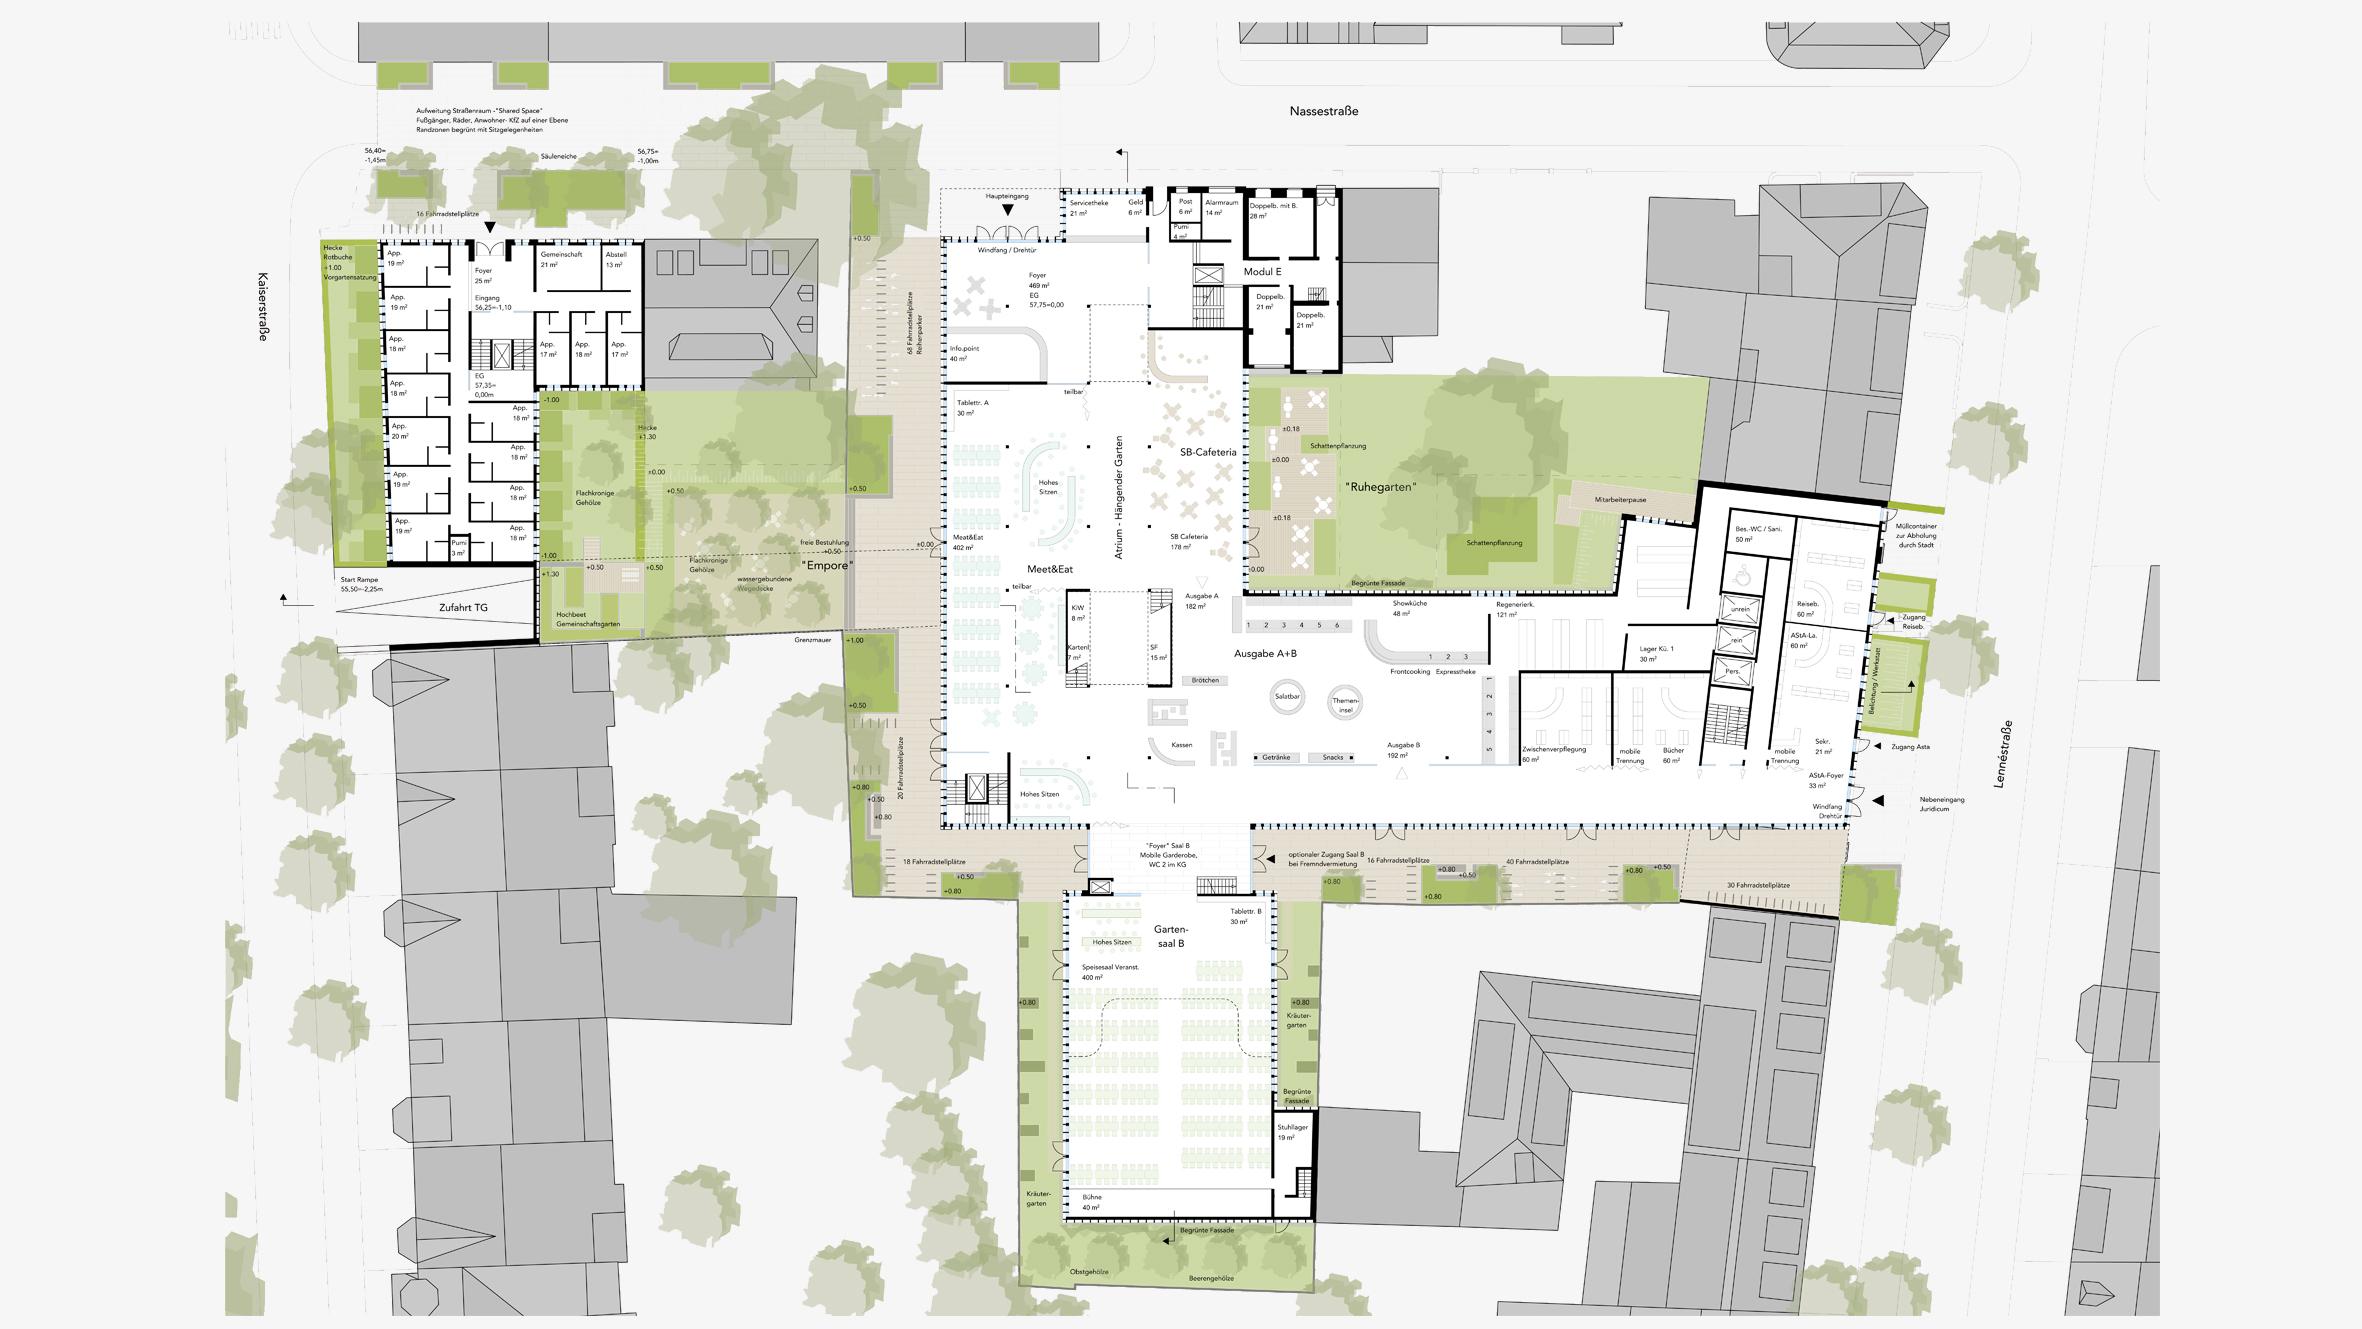 Architekt Bonn Wettbewerb Carré Nassestraße - Koenigs Rütter Architekt Bonn